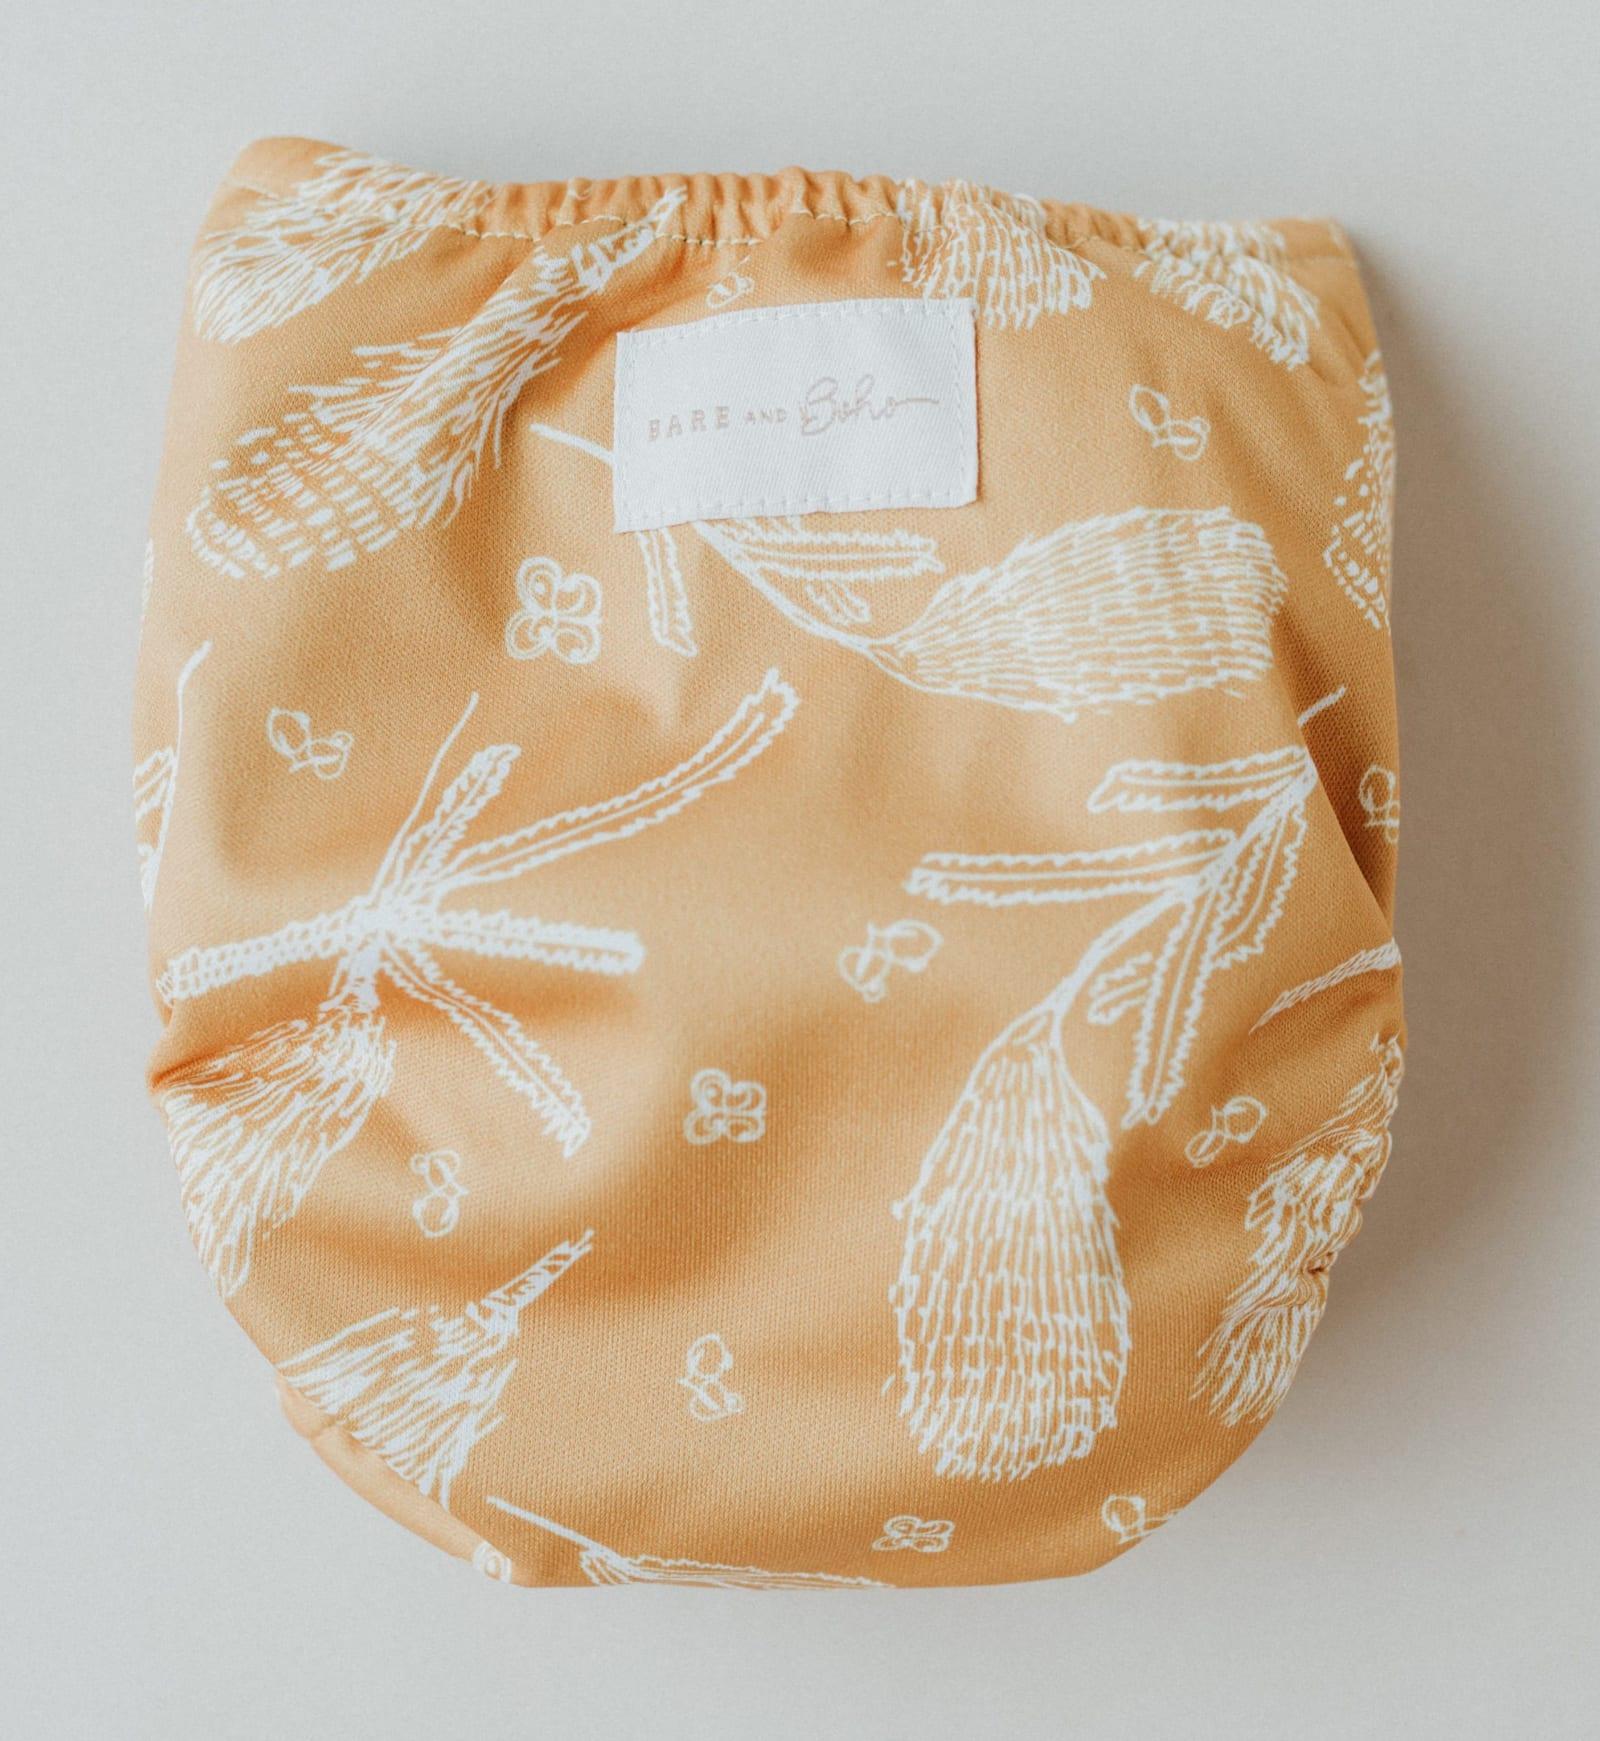 BARE and Boho Snap-in-One Windel Newborn (inkl. Saugeinlage)